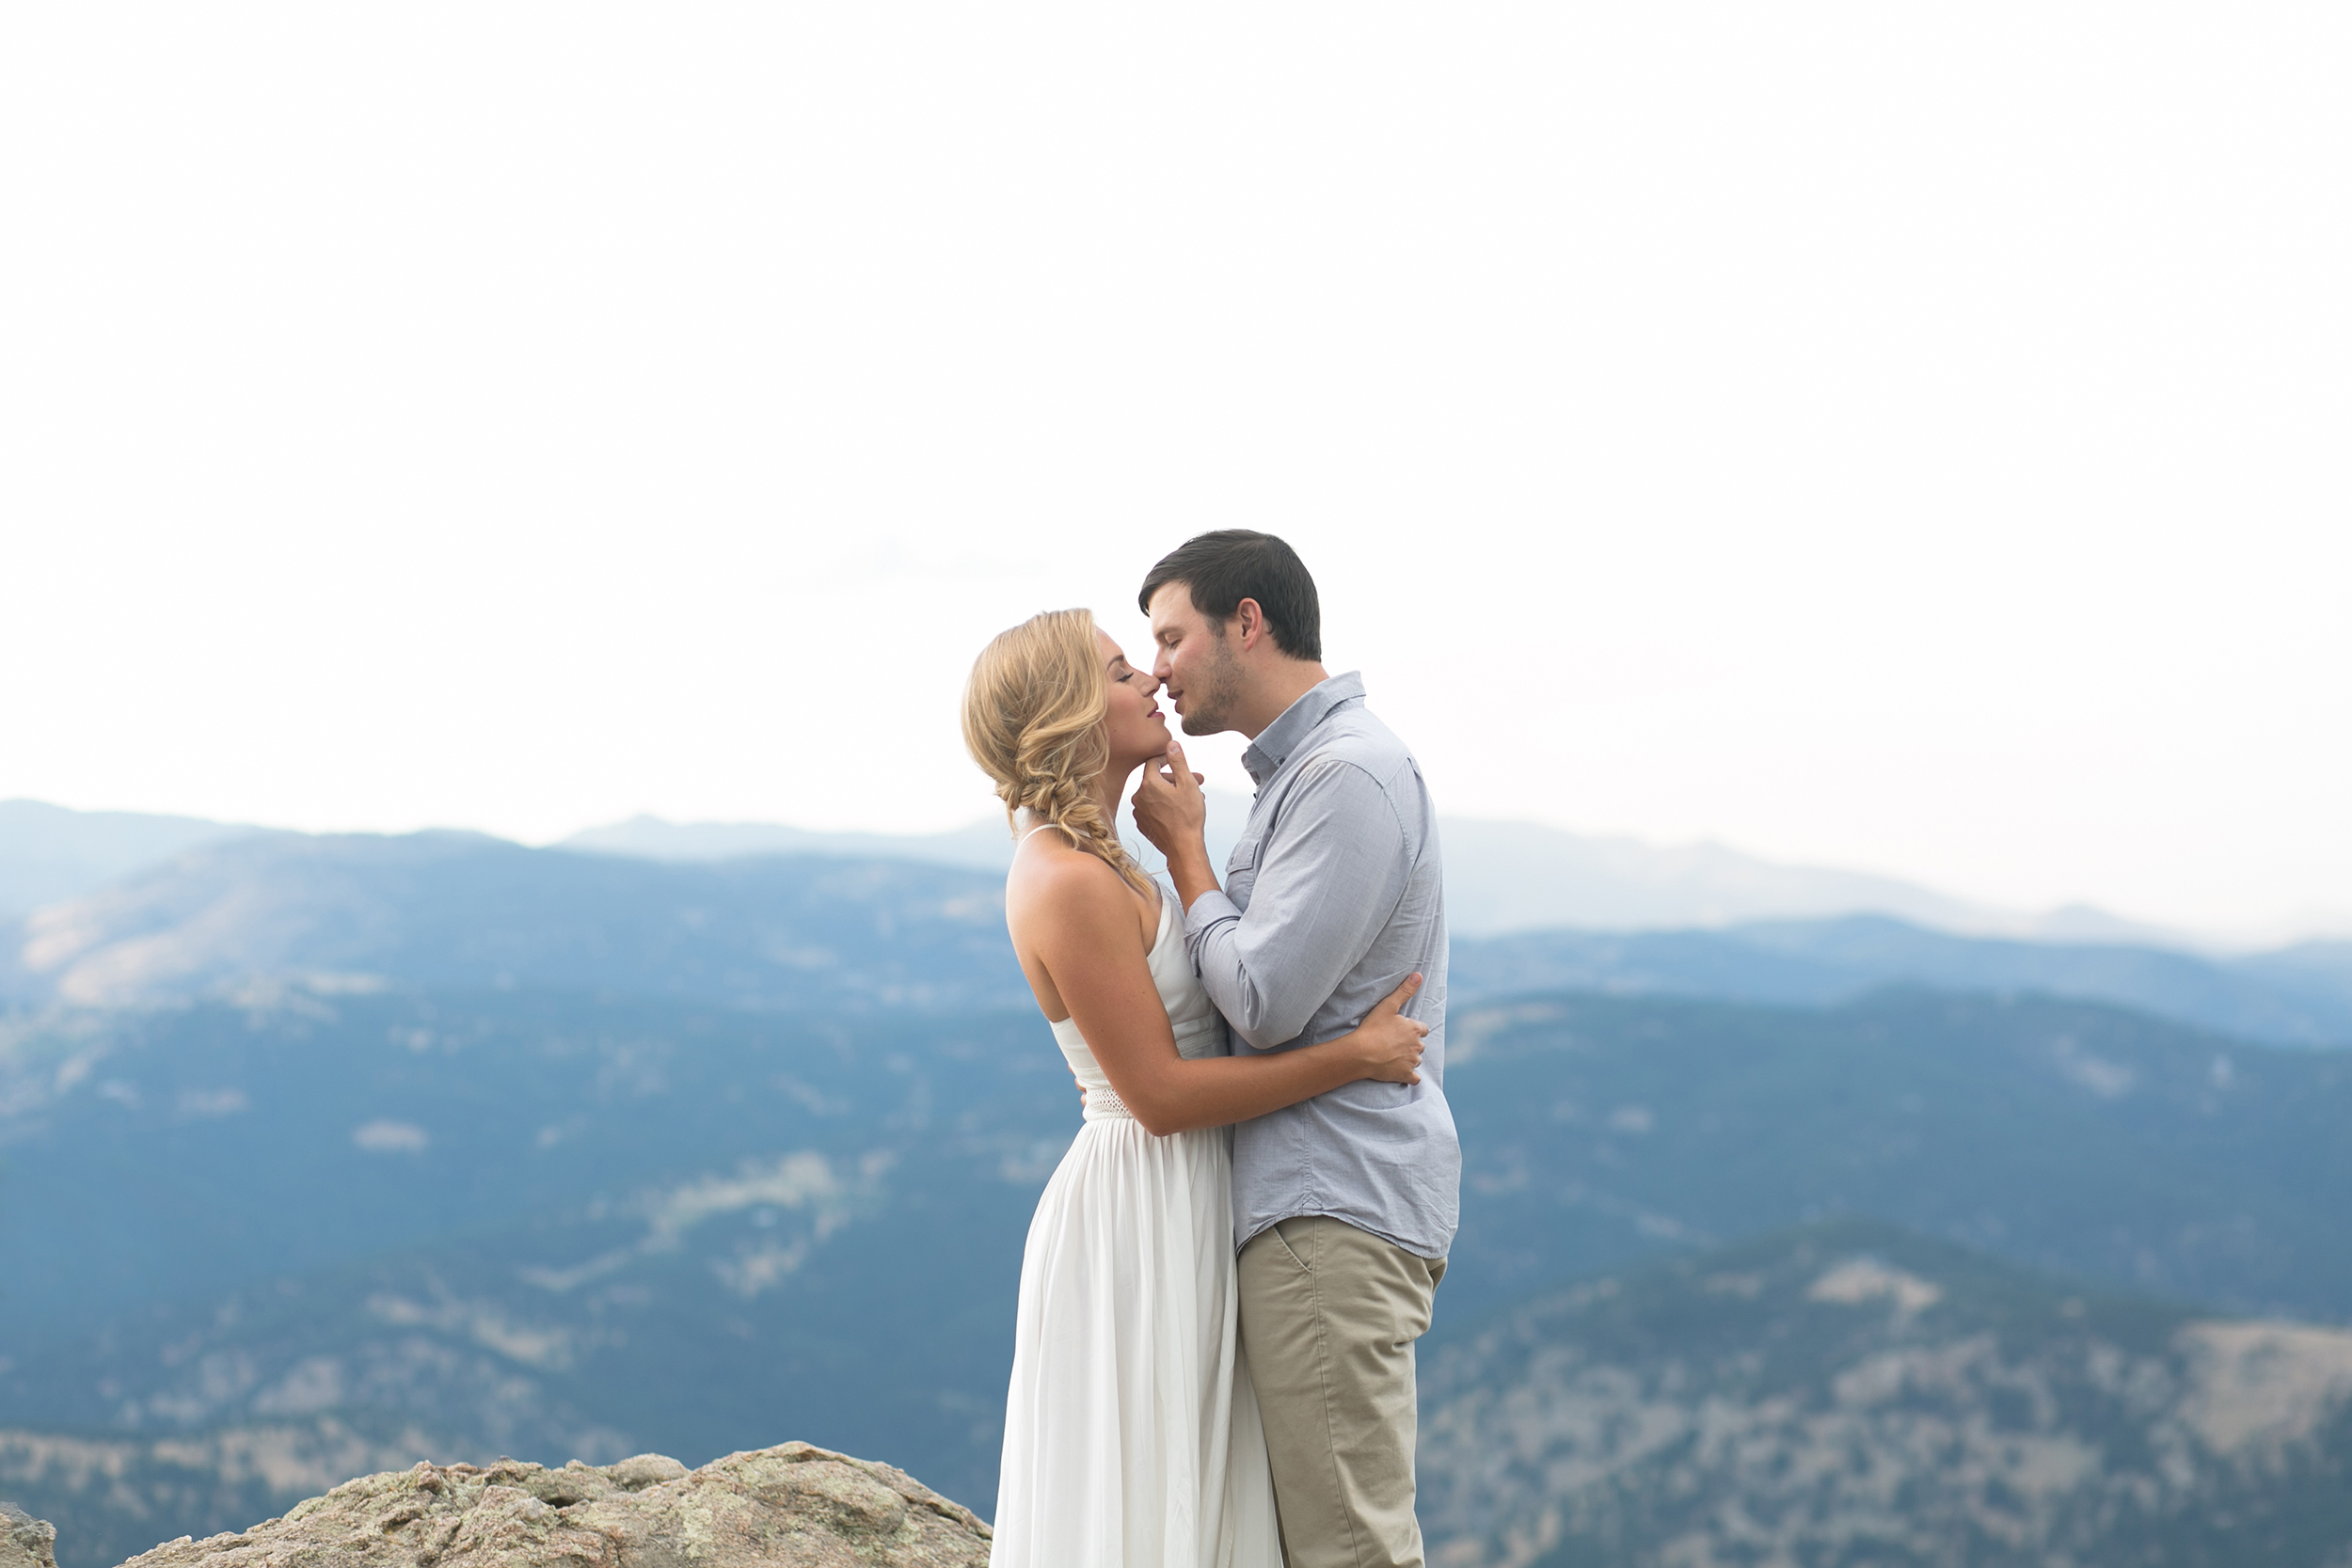 Austin_Wedding_Photographer_Kimberly_Brooke_Photographic_166.jpg